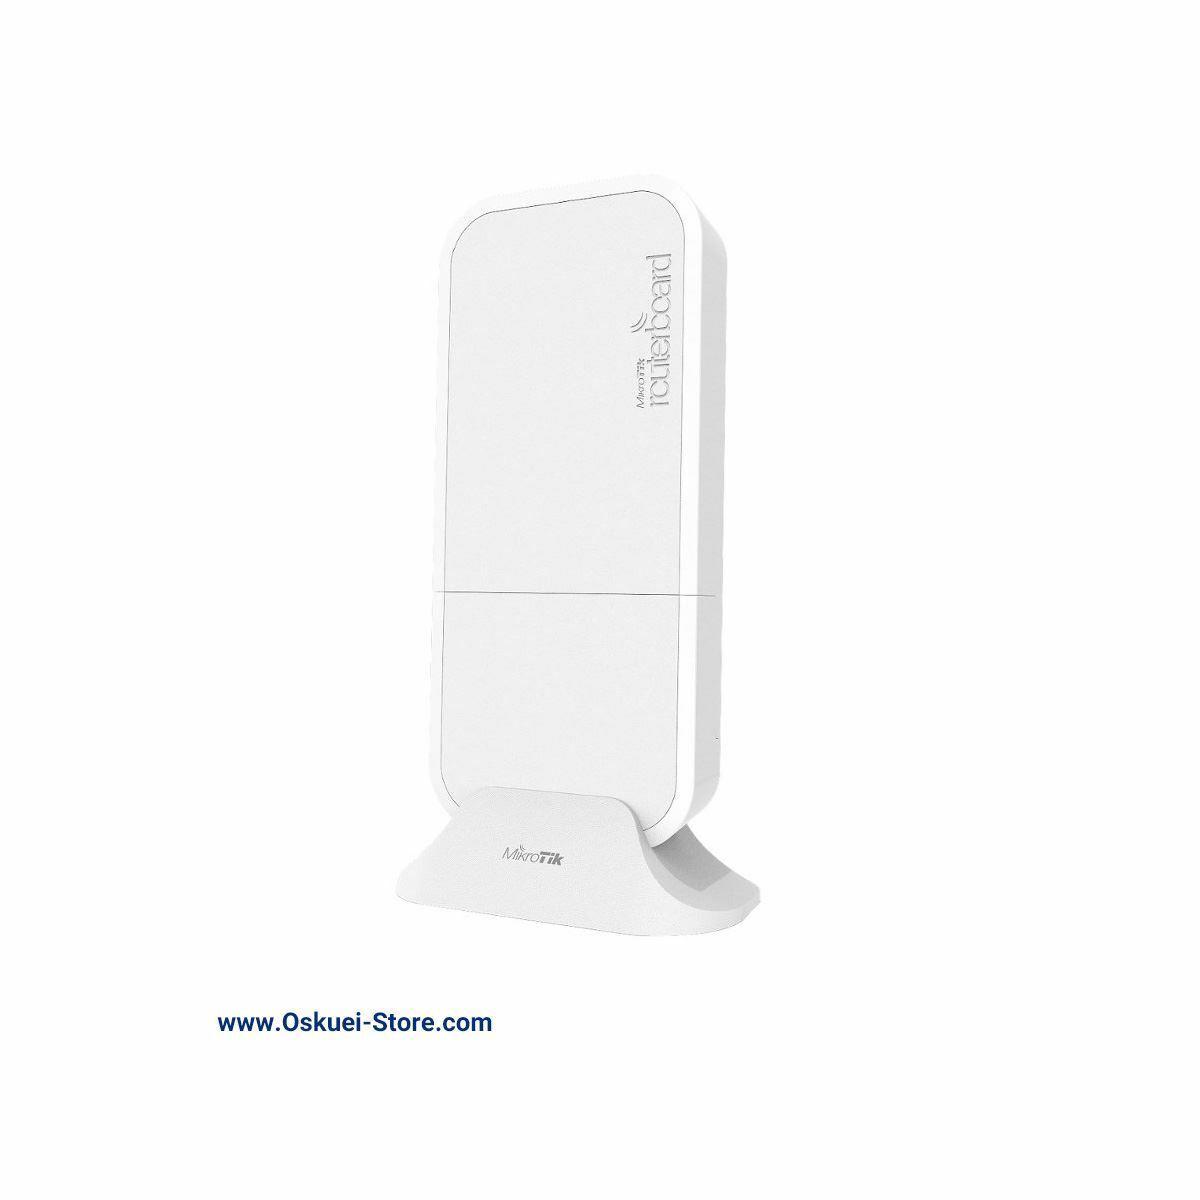 RBwAPR-2nD&R11e-LTE-US